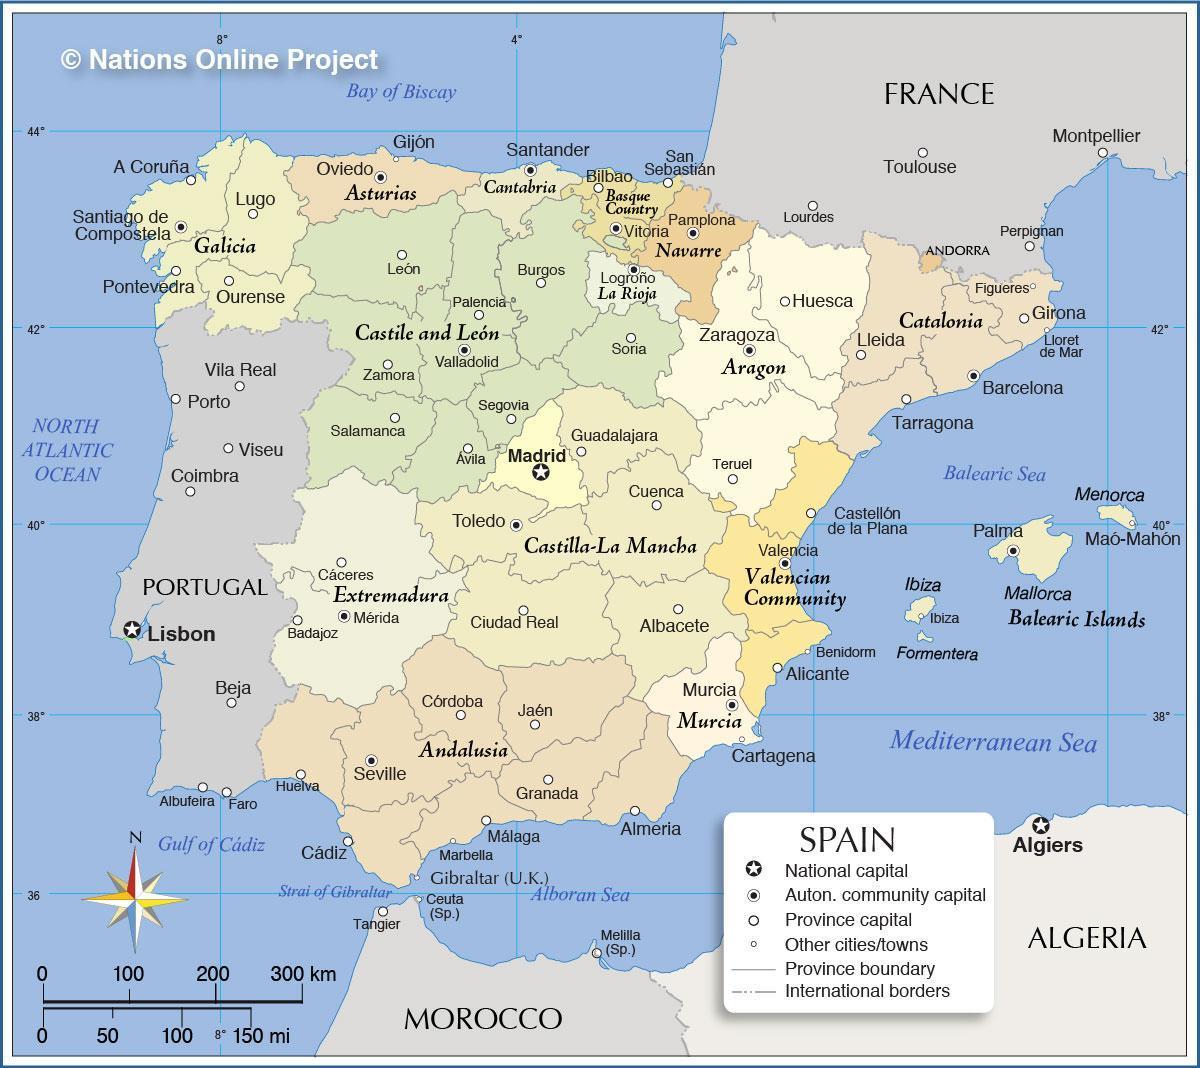 Terkep Spanyolorszag Spanyolorszag Terkep Del Europaban Europa